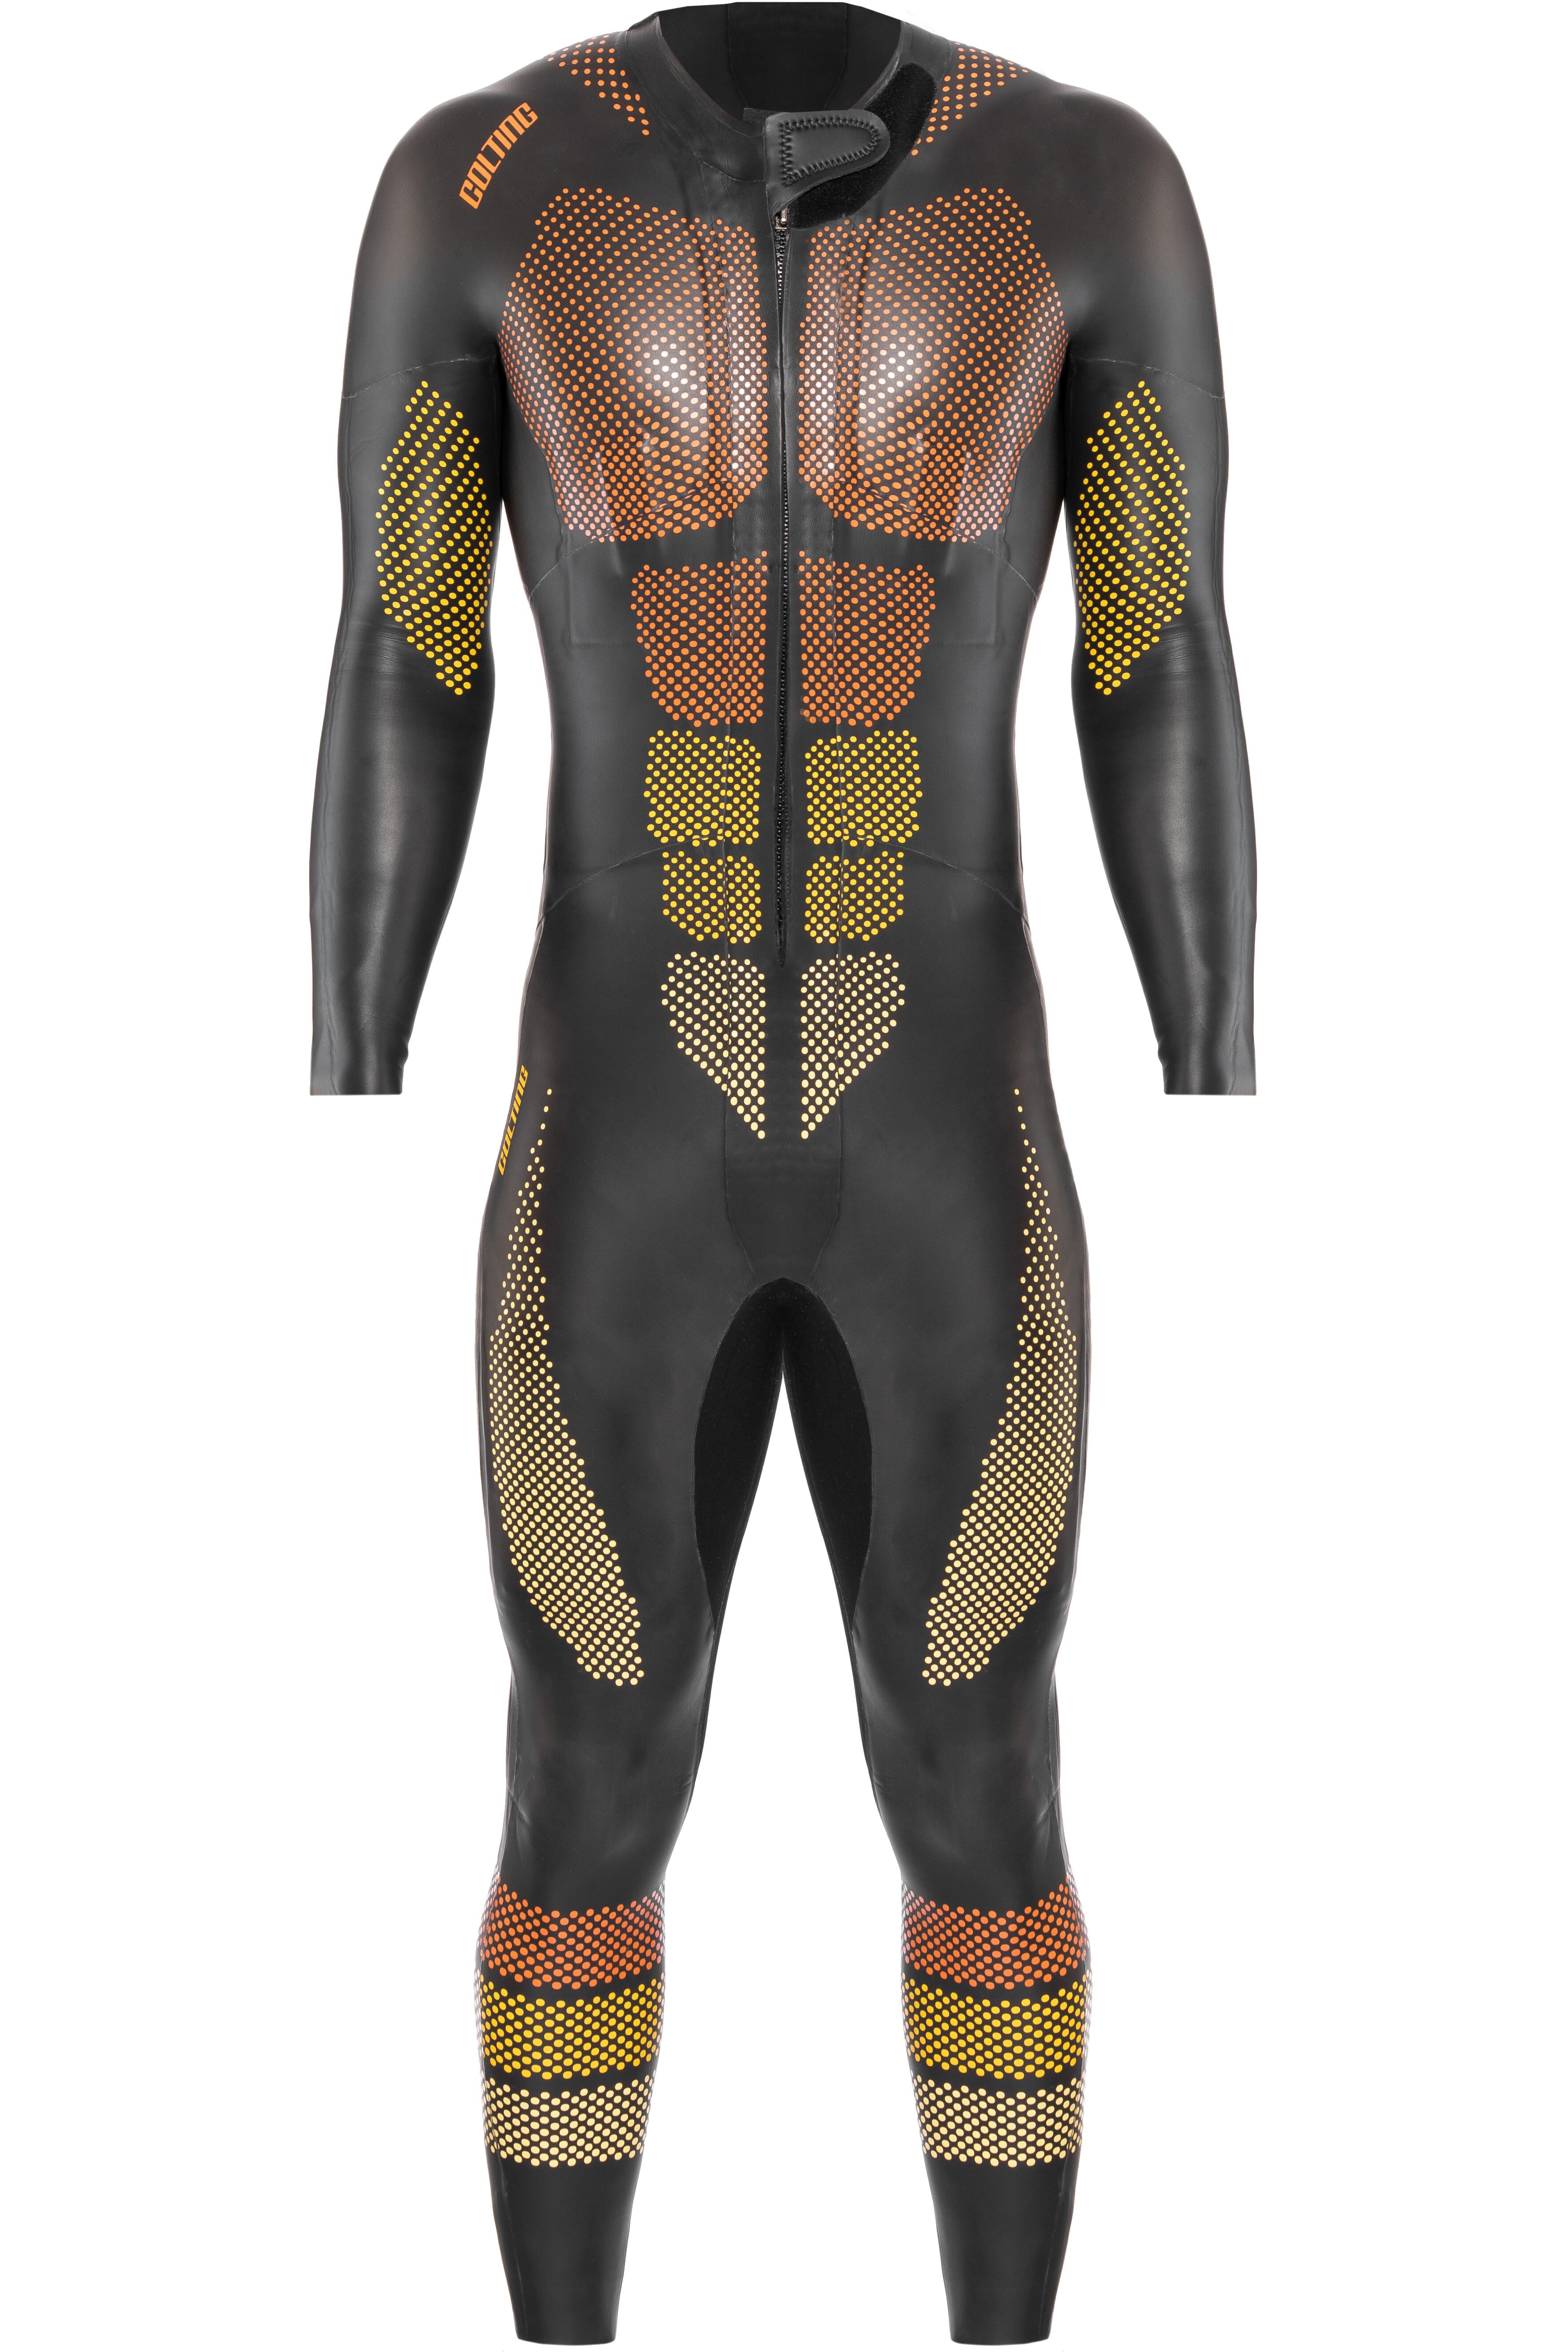 Colting Wetsuits SR02 Herr gul svart - till fenomenalt pris på Bikester 48b396a2b1eb5